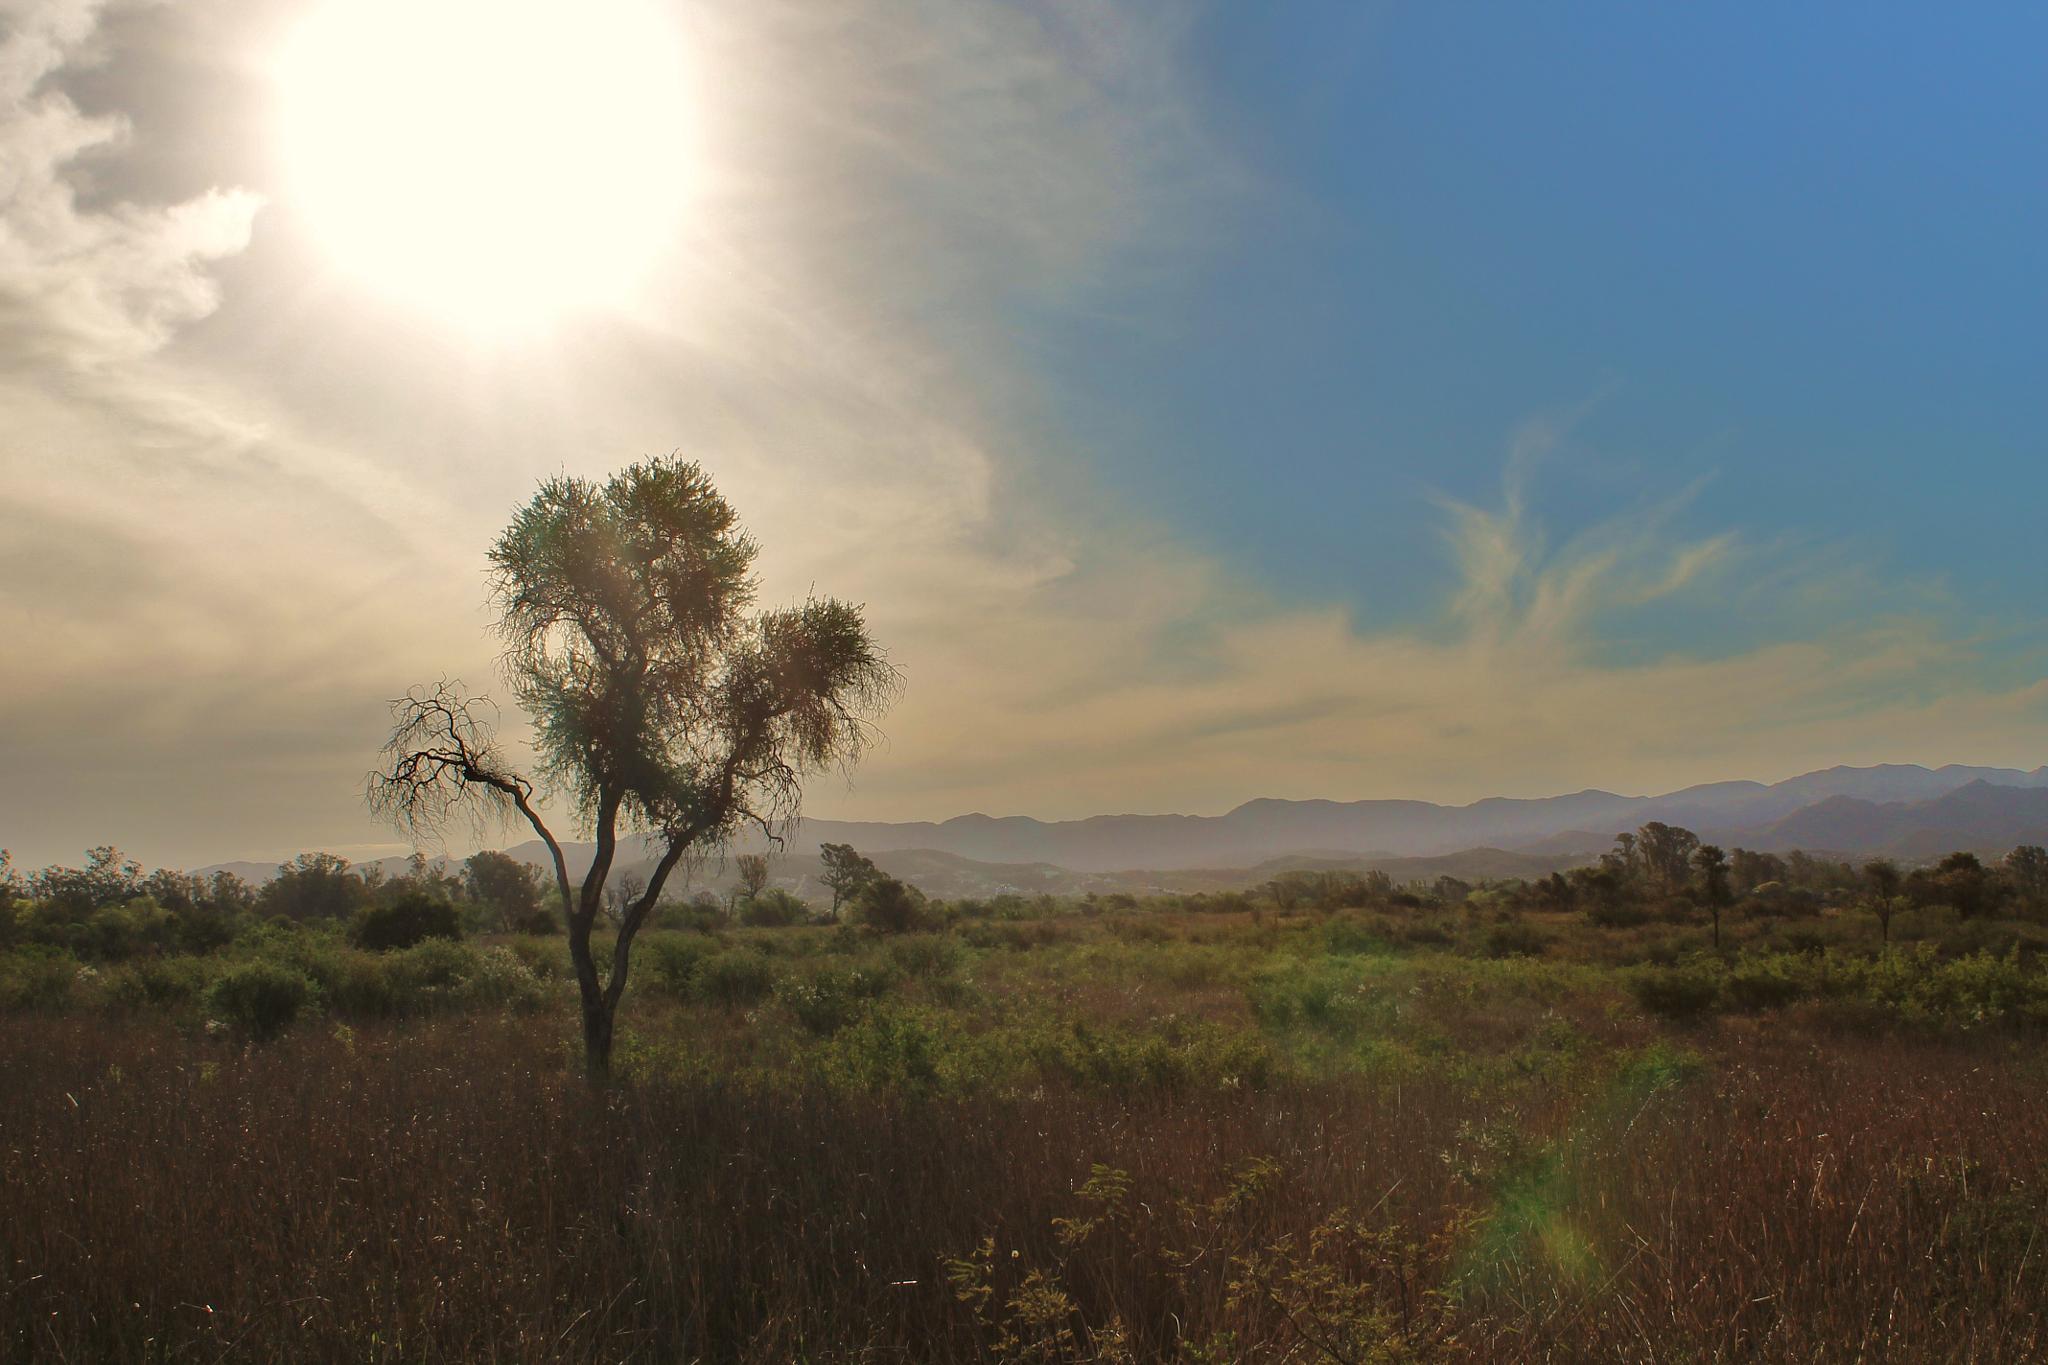 Reserva San Martin by patricia alejandra sanchez